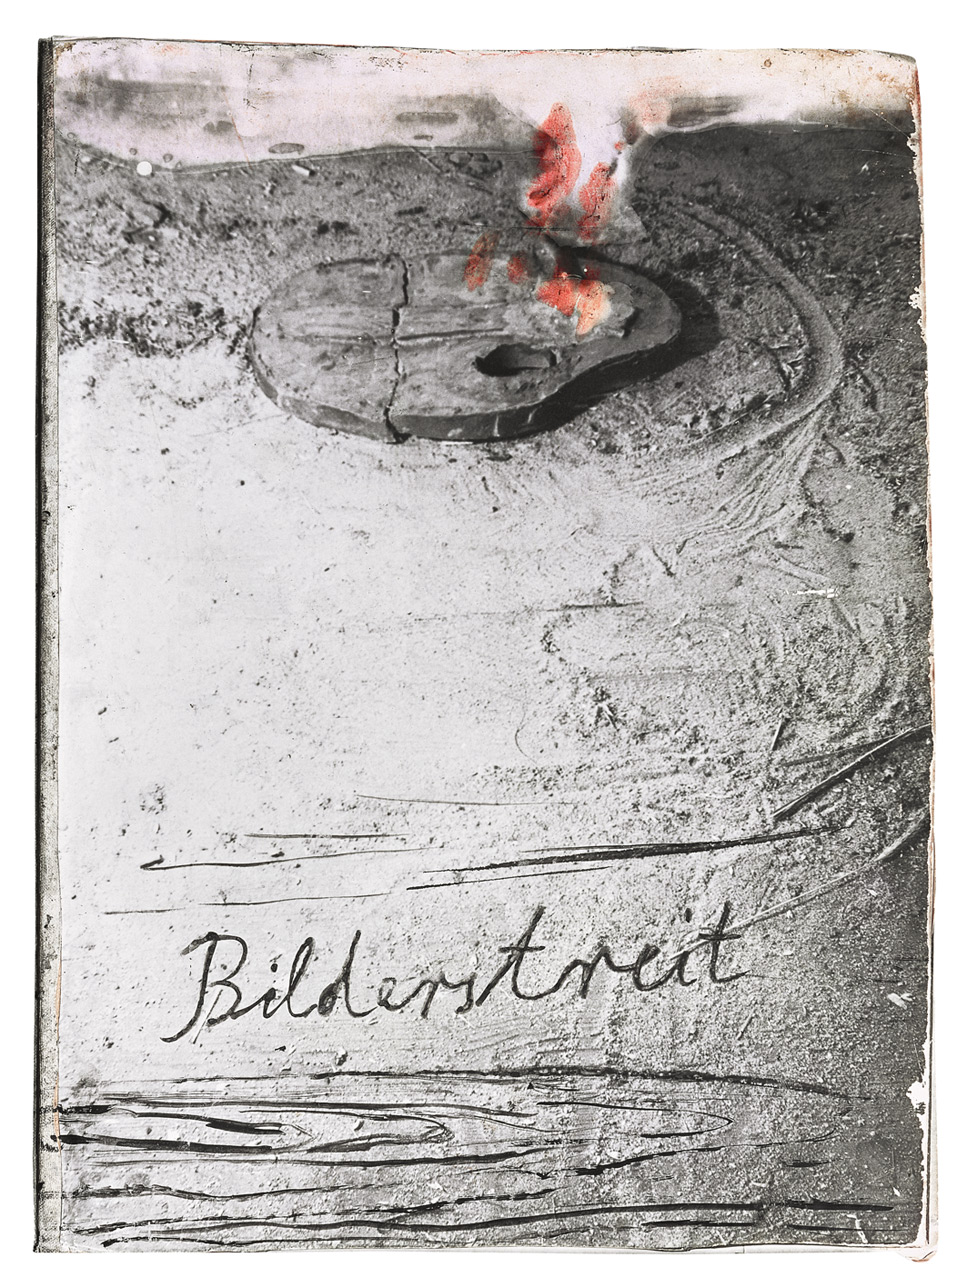 Iconoclastic controversy | Anselm Kiefer | Guggenheim Bilbao Museoa